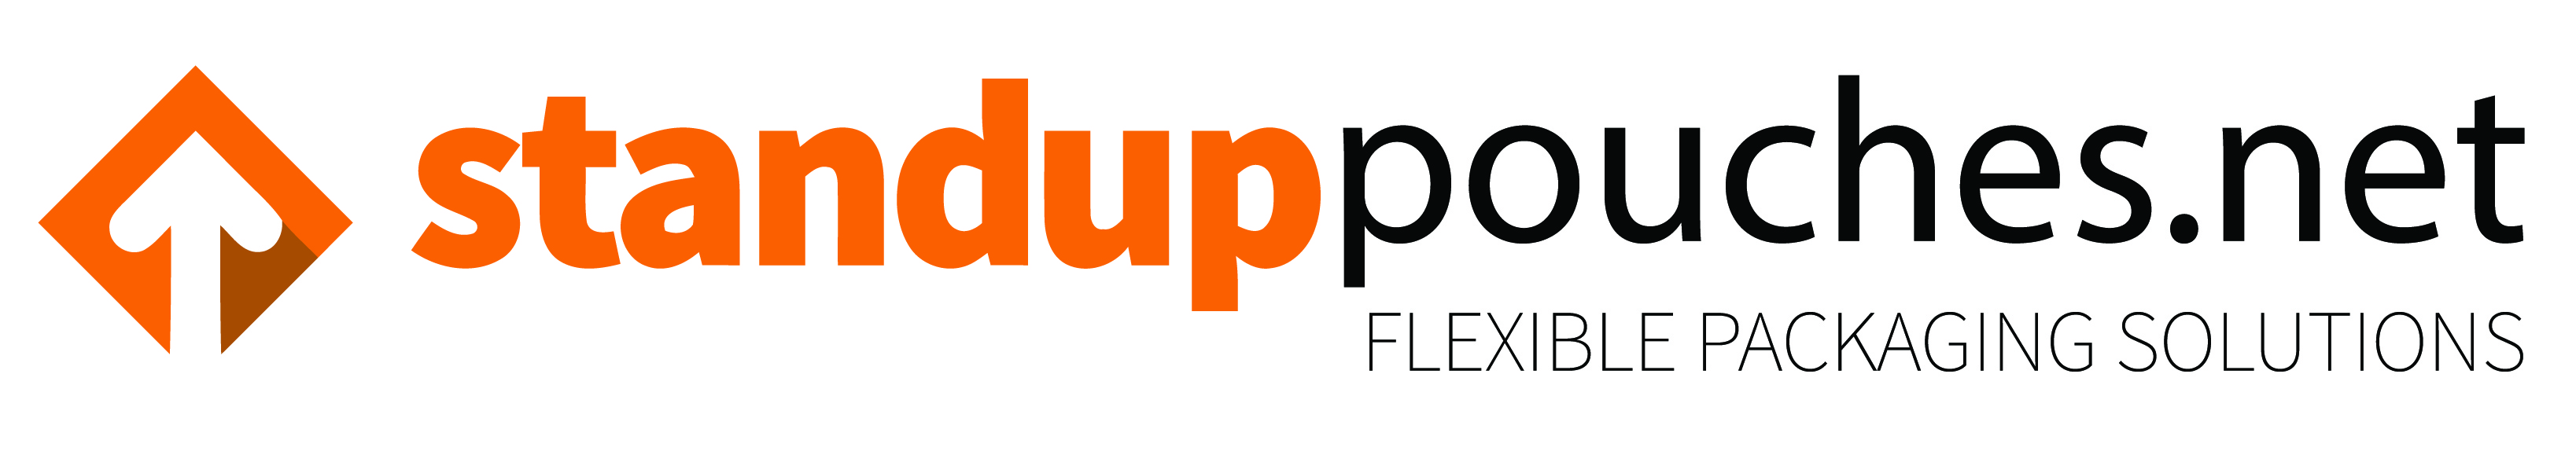 sup-logo-2015_CMYK.jpg